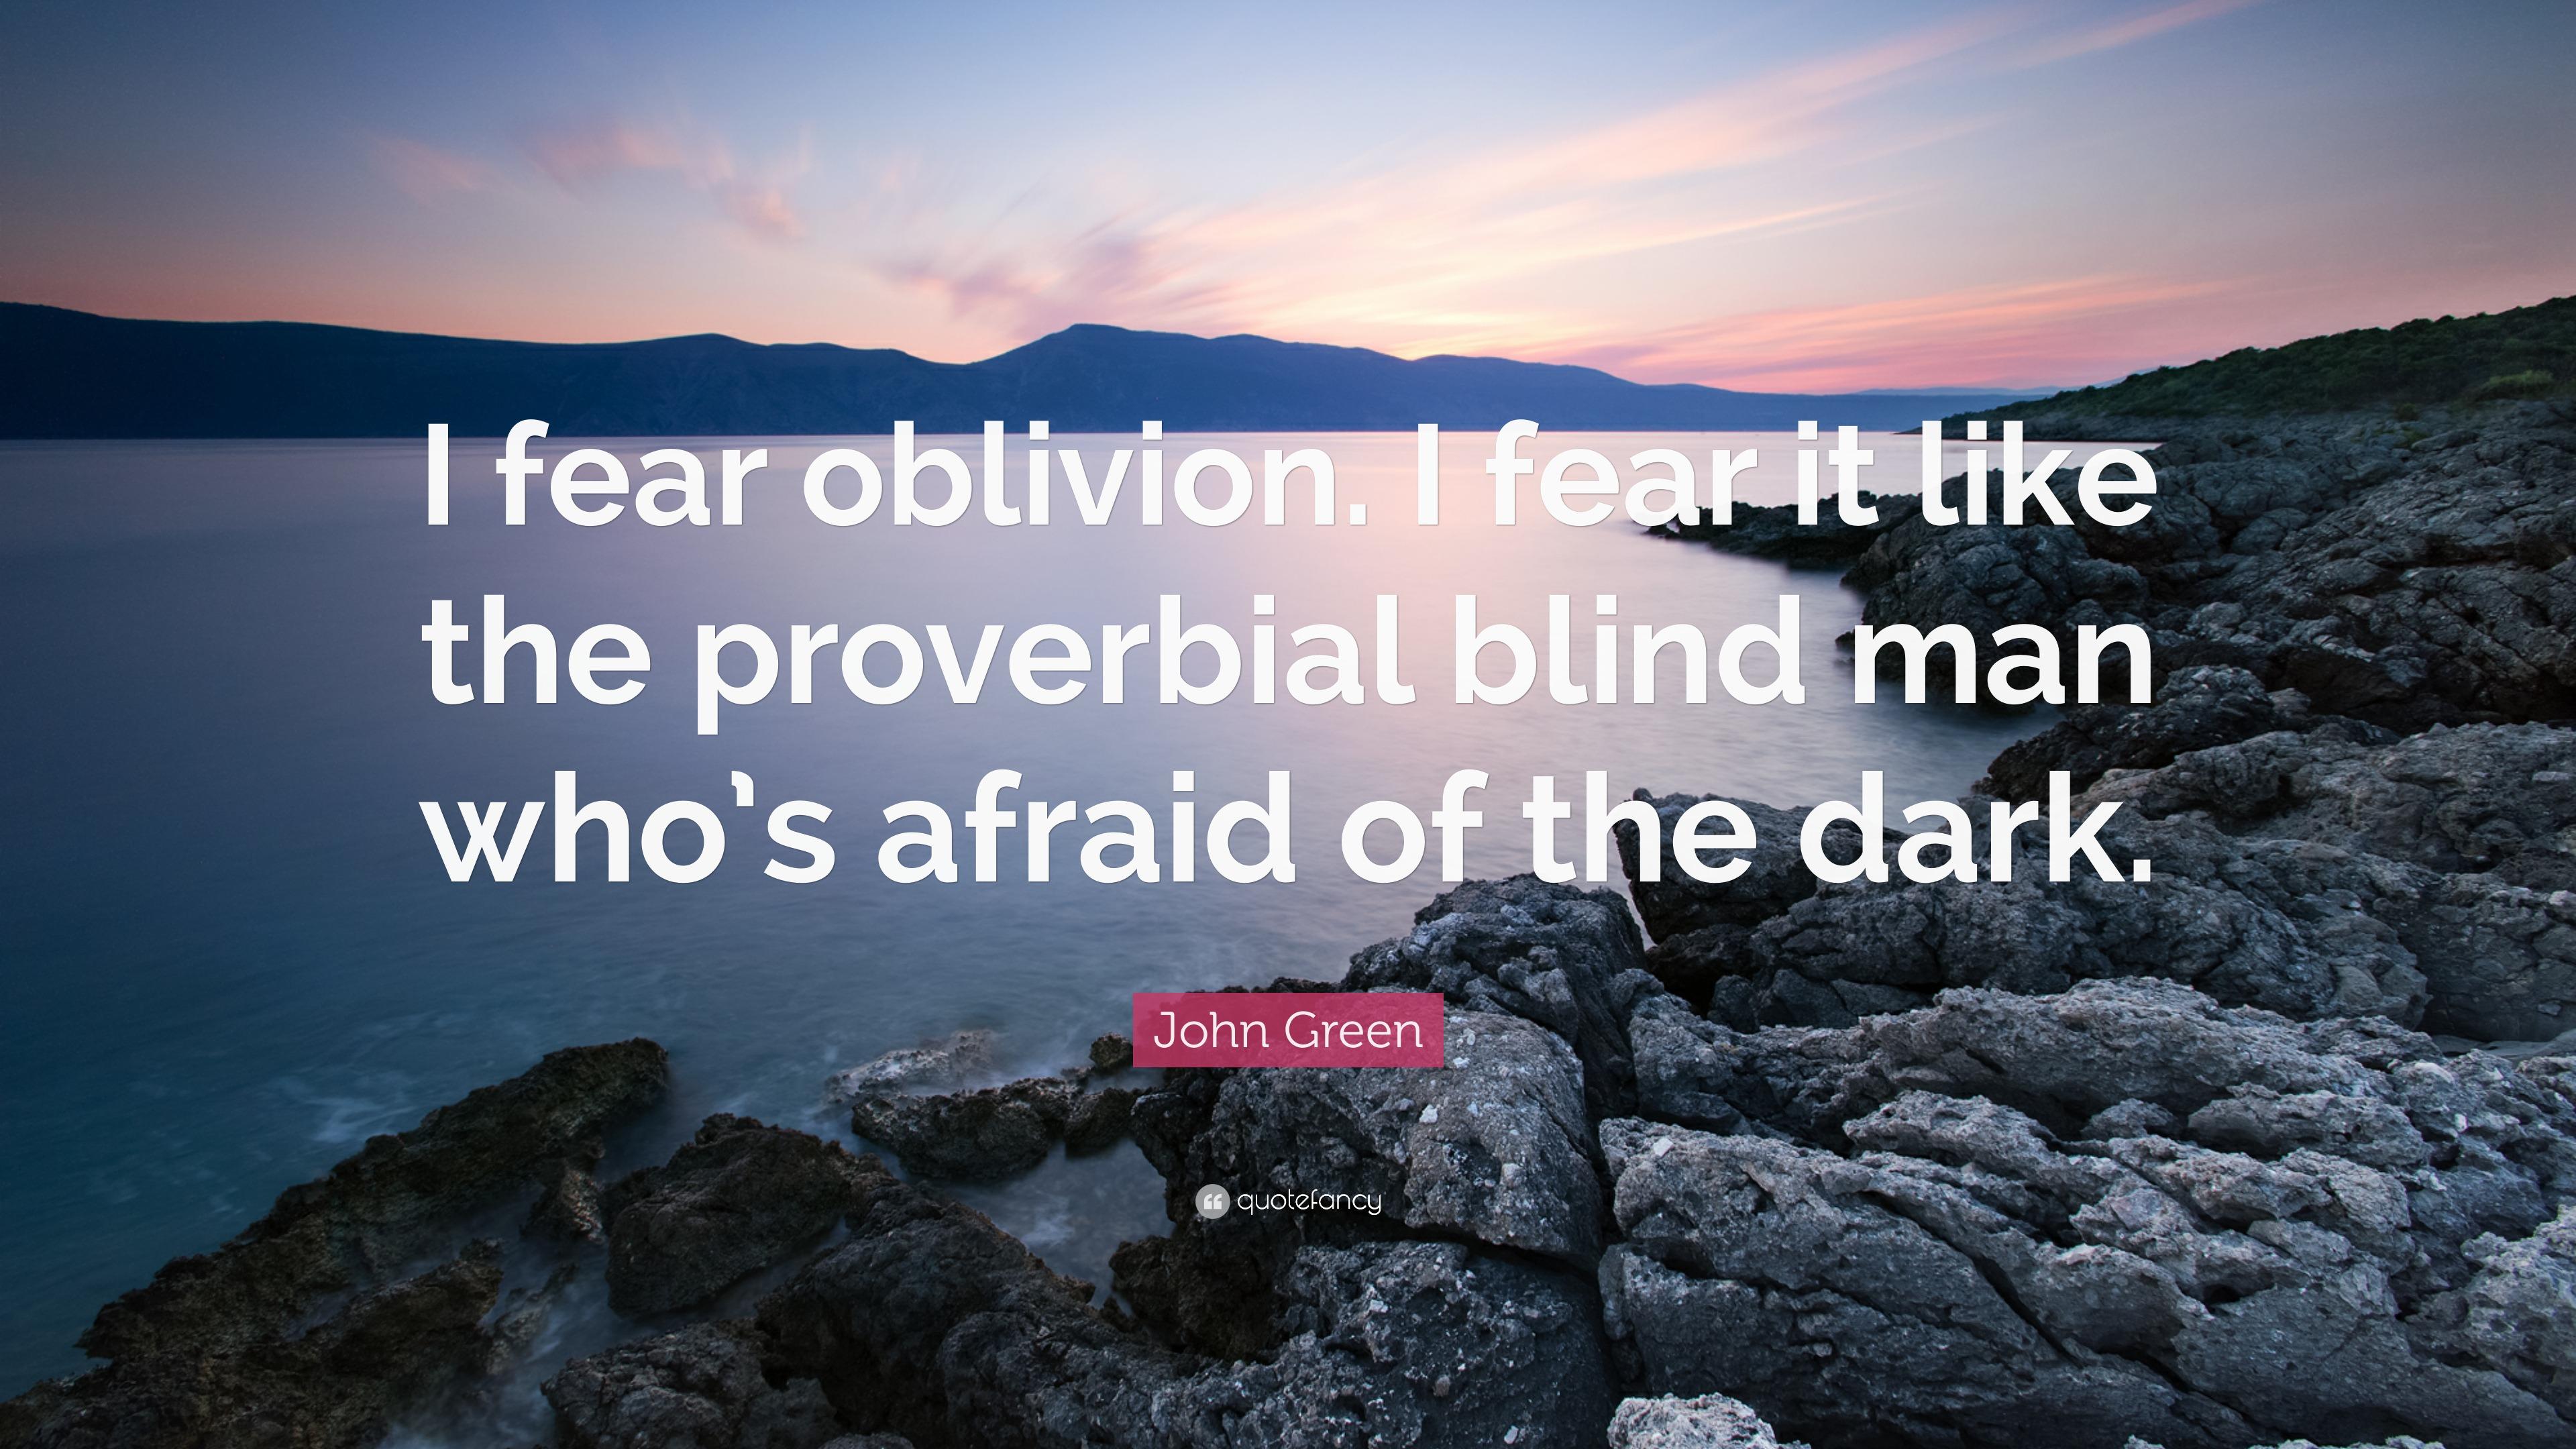 A man whos blind